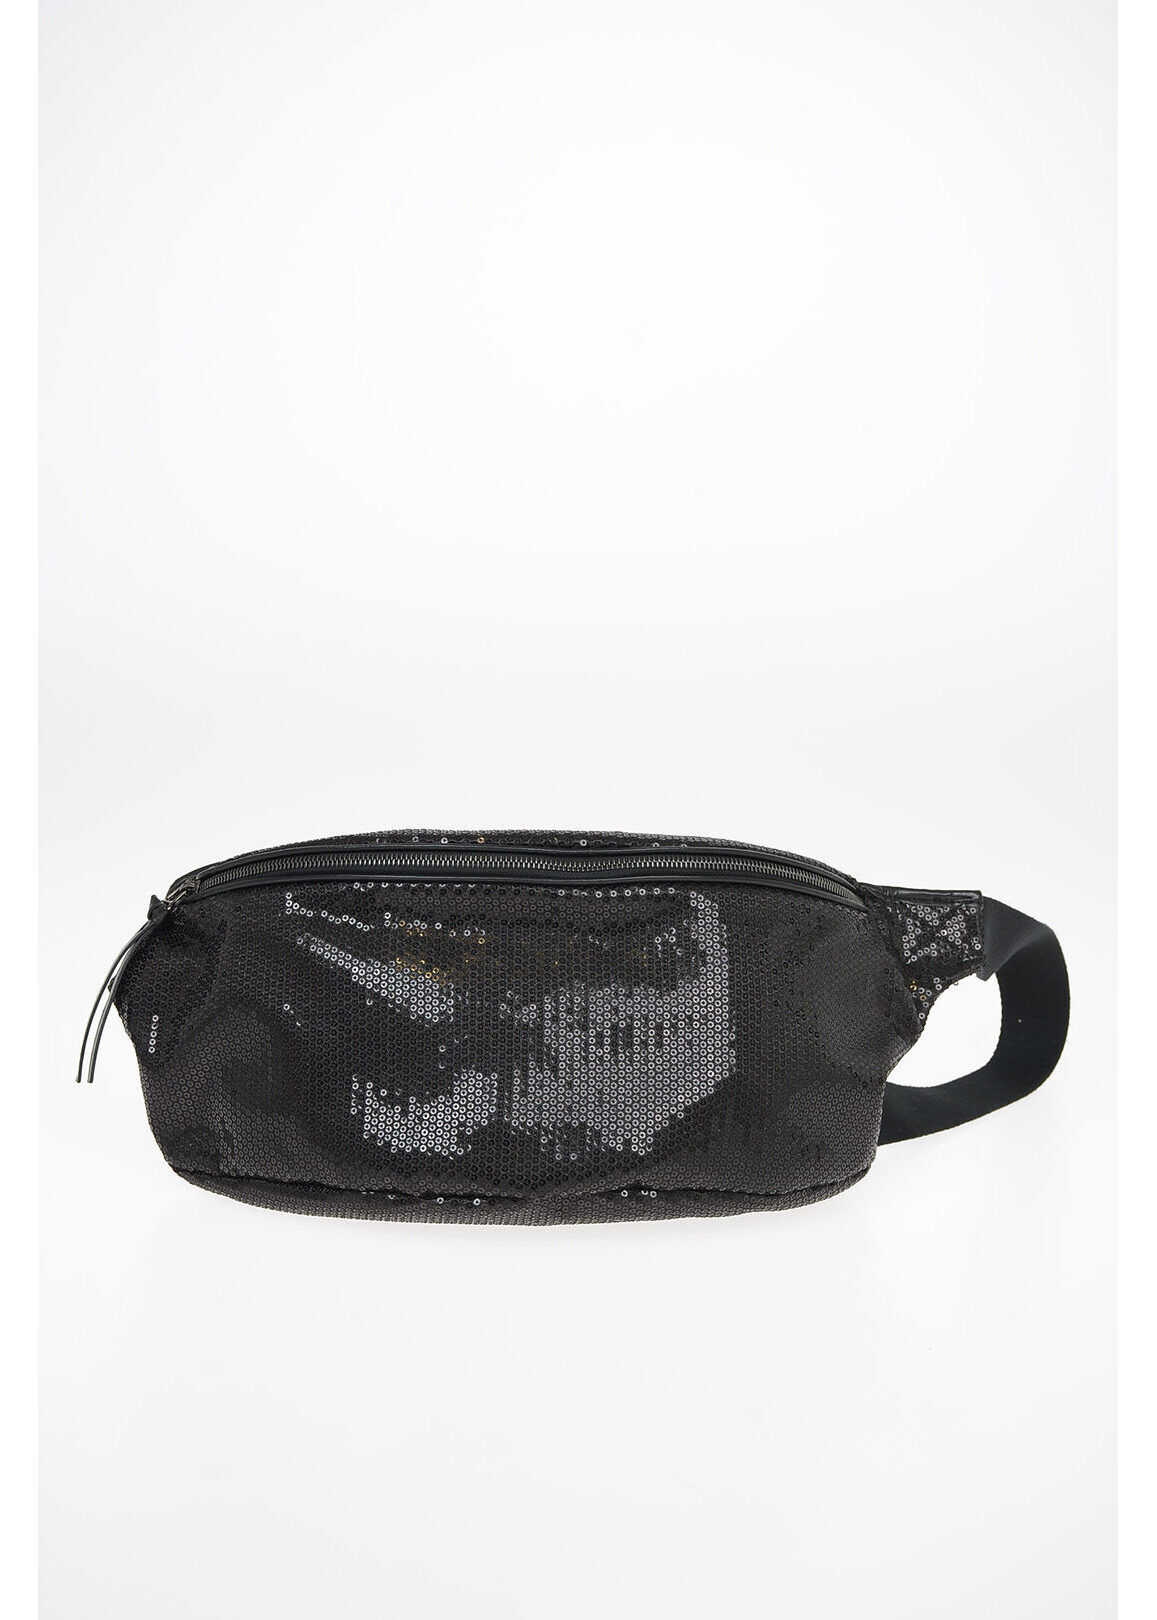 Maison Margiela MM6 Sequined Belt Bag BLACK imagine b-mall.ro